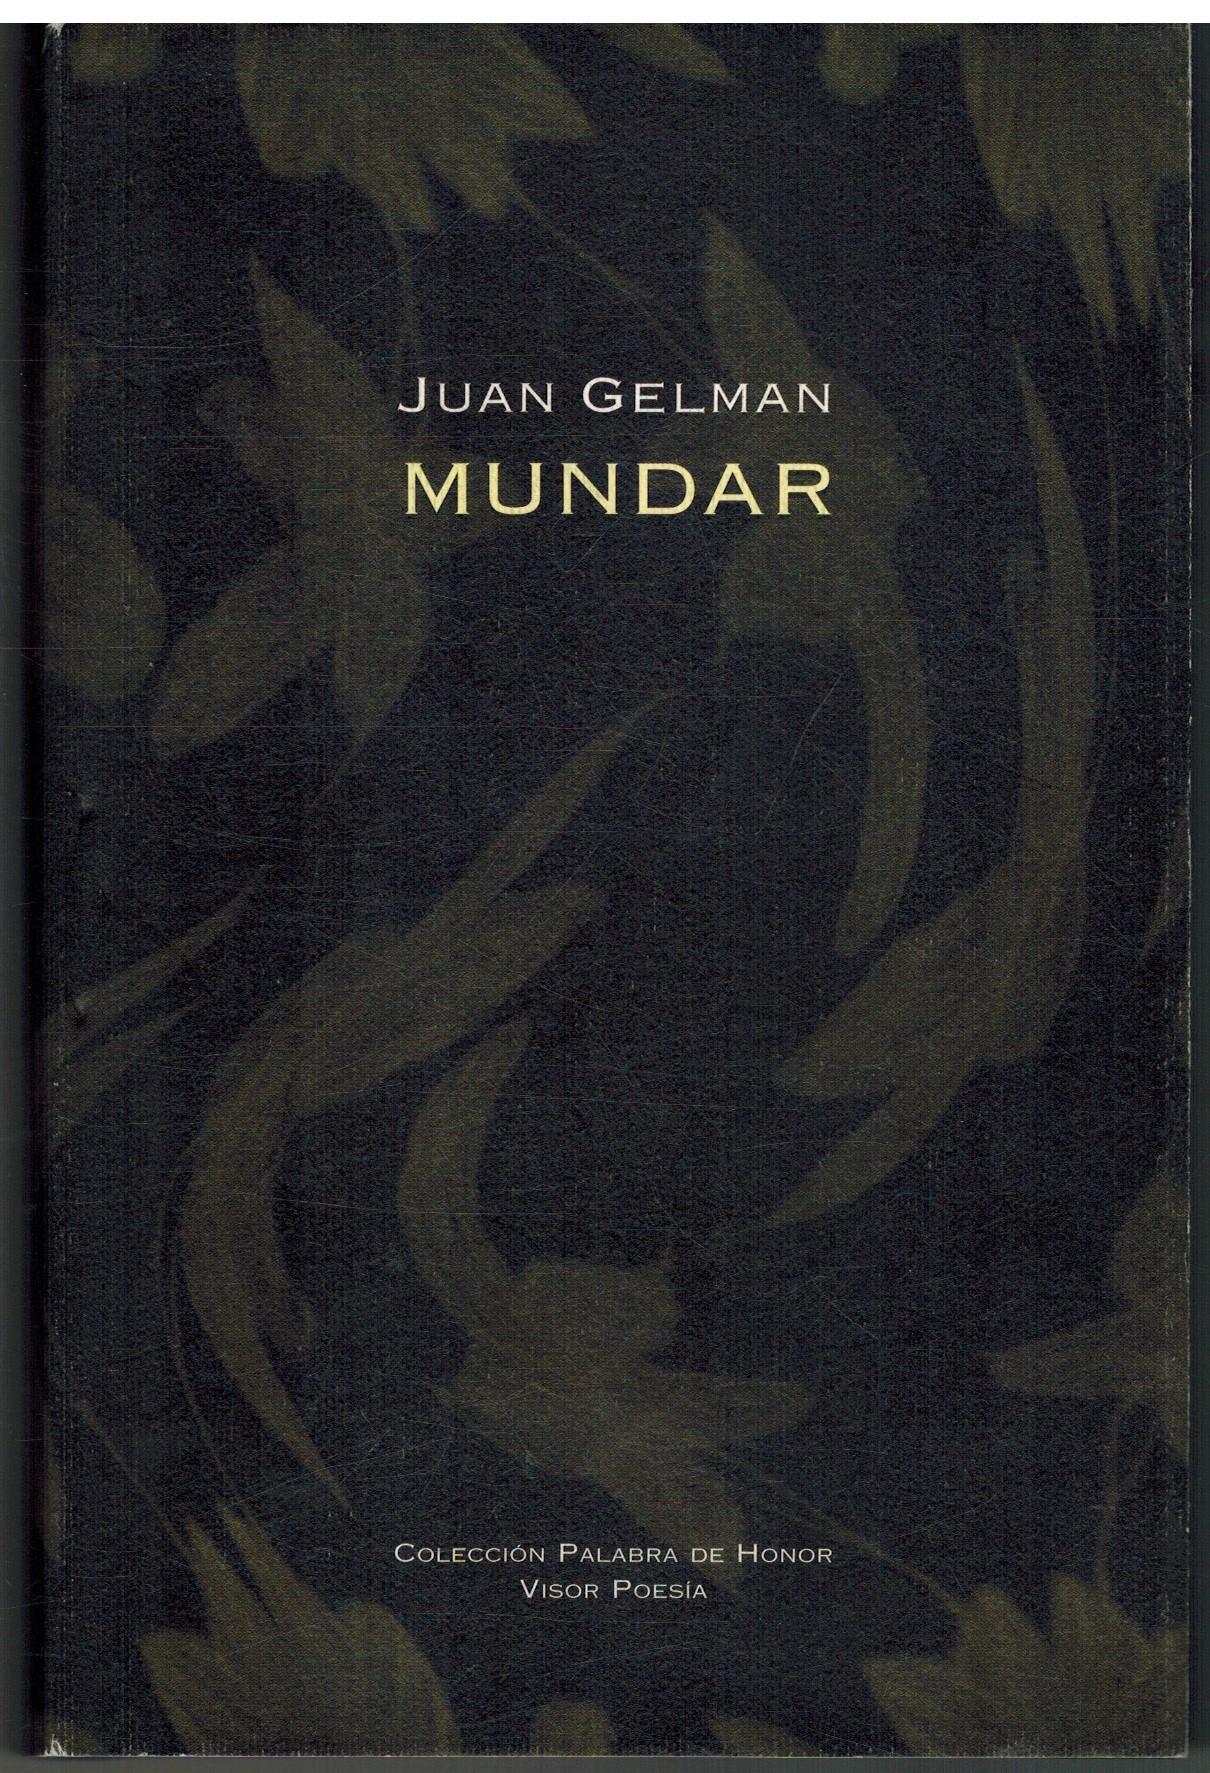 MUNDAR - JUAN GELMAN